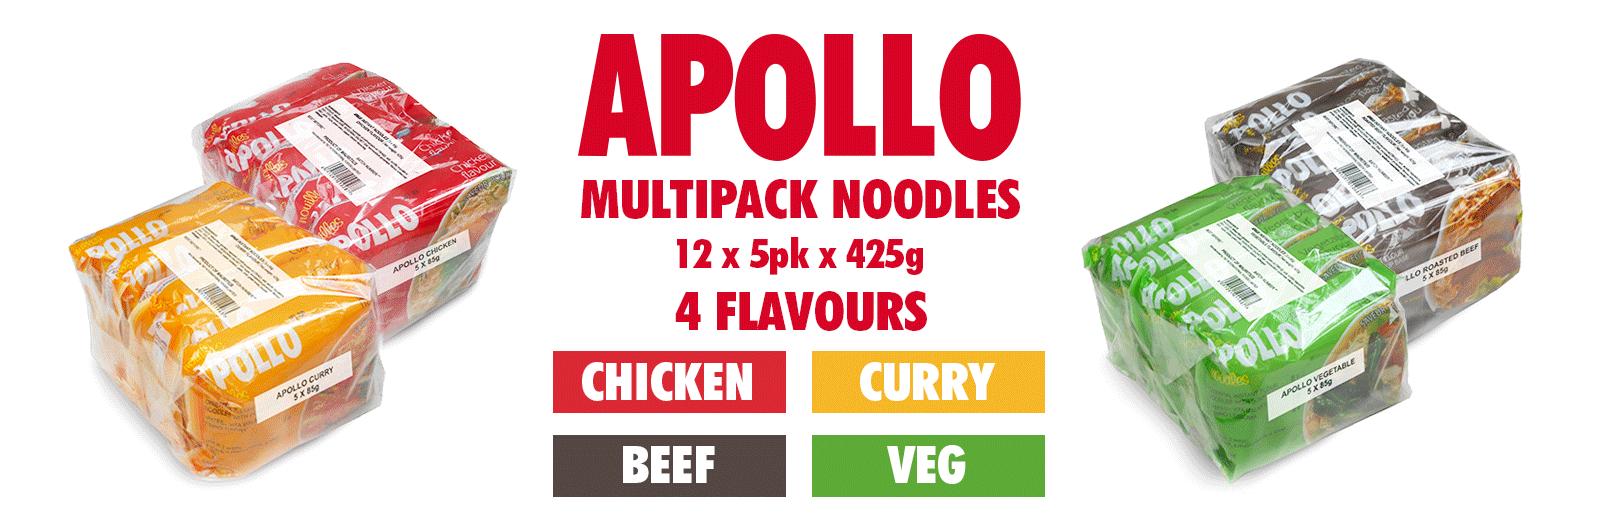 Apollo multipacks